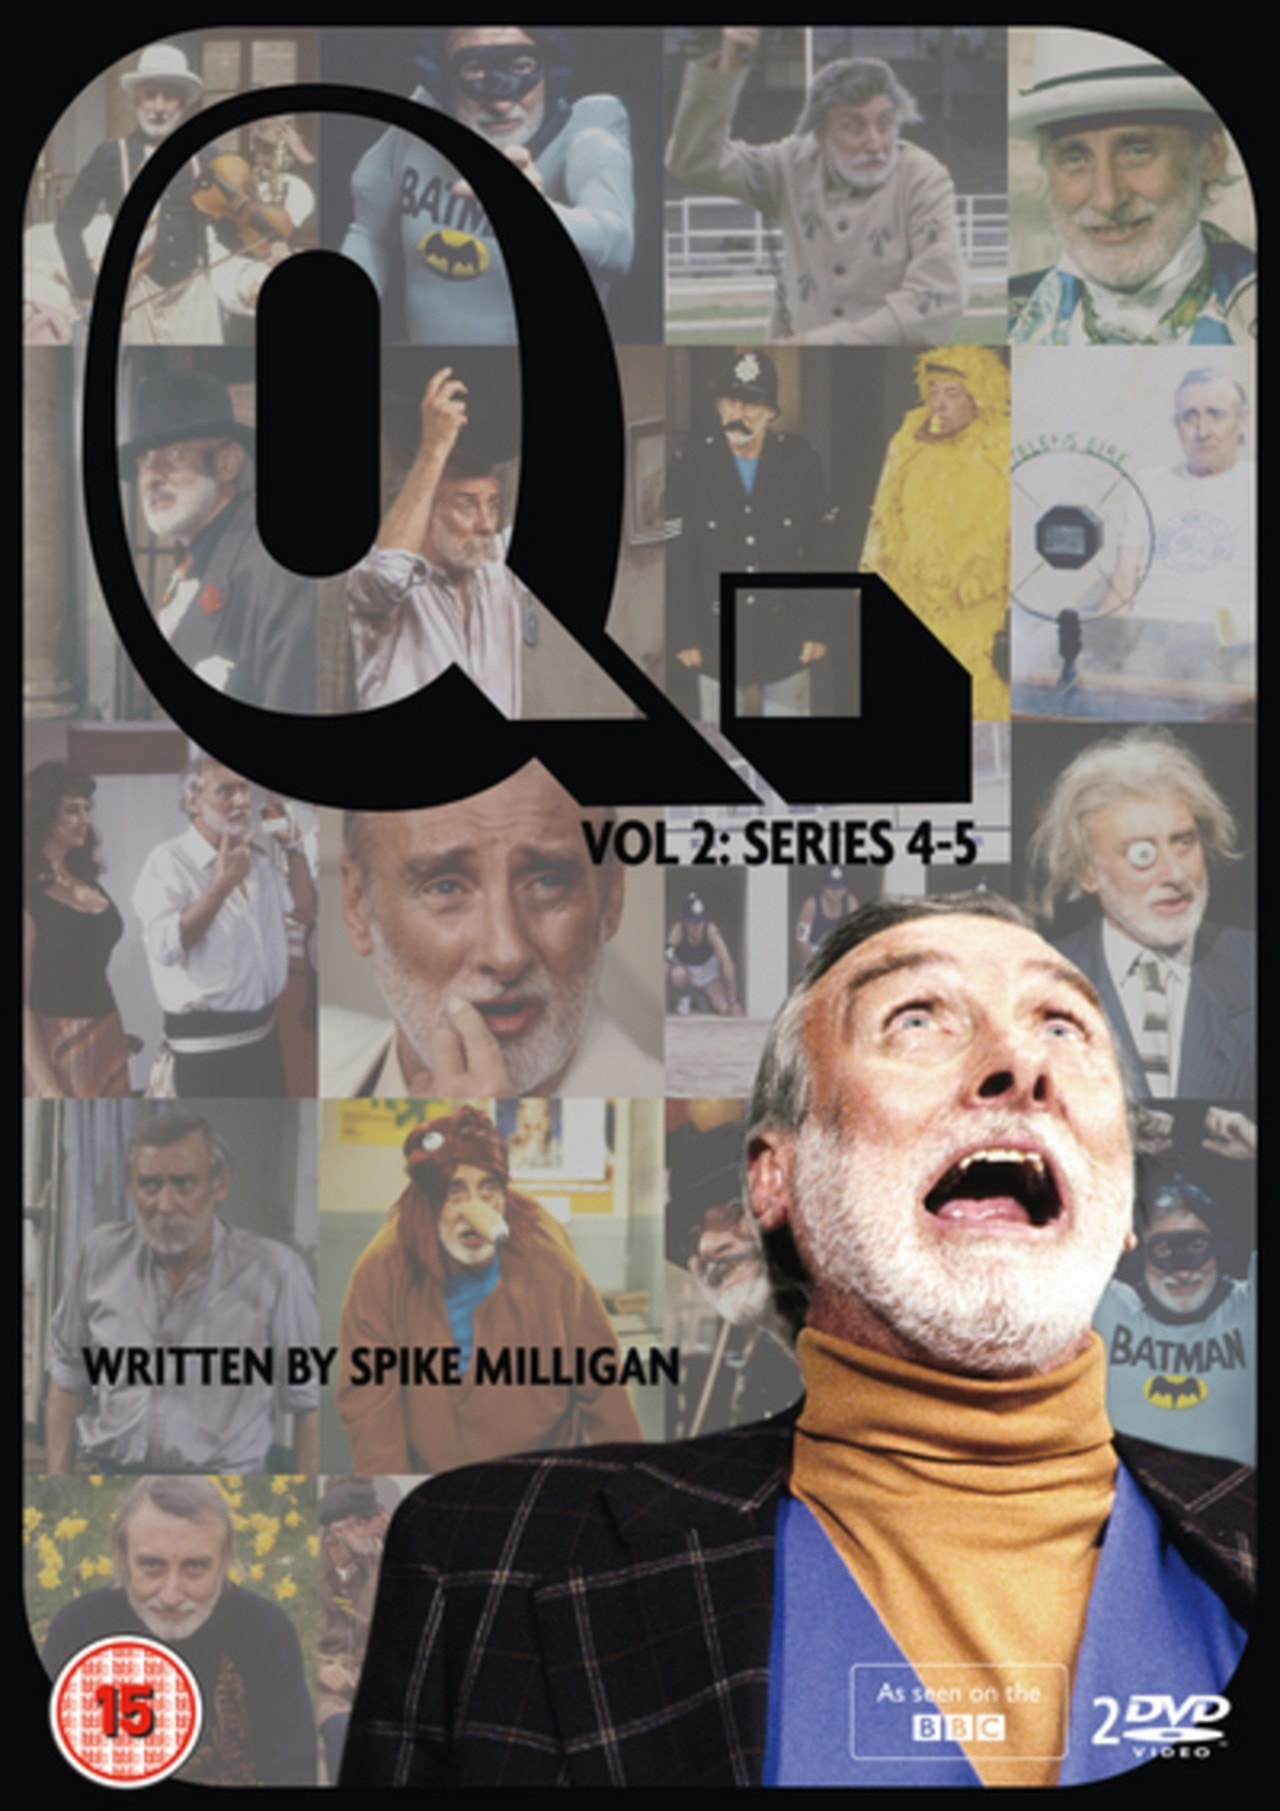 Q. - Vol 2: Series 4-5 - 1